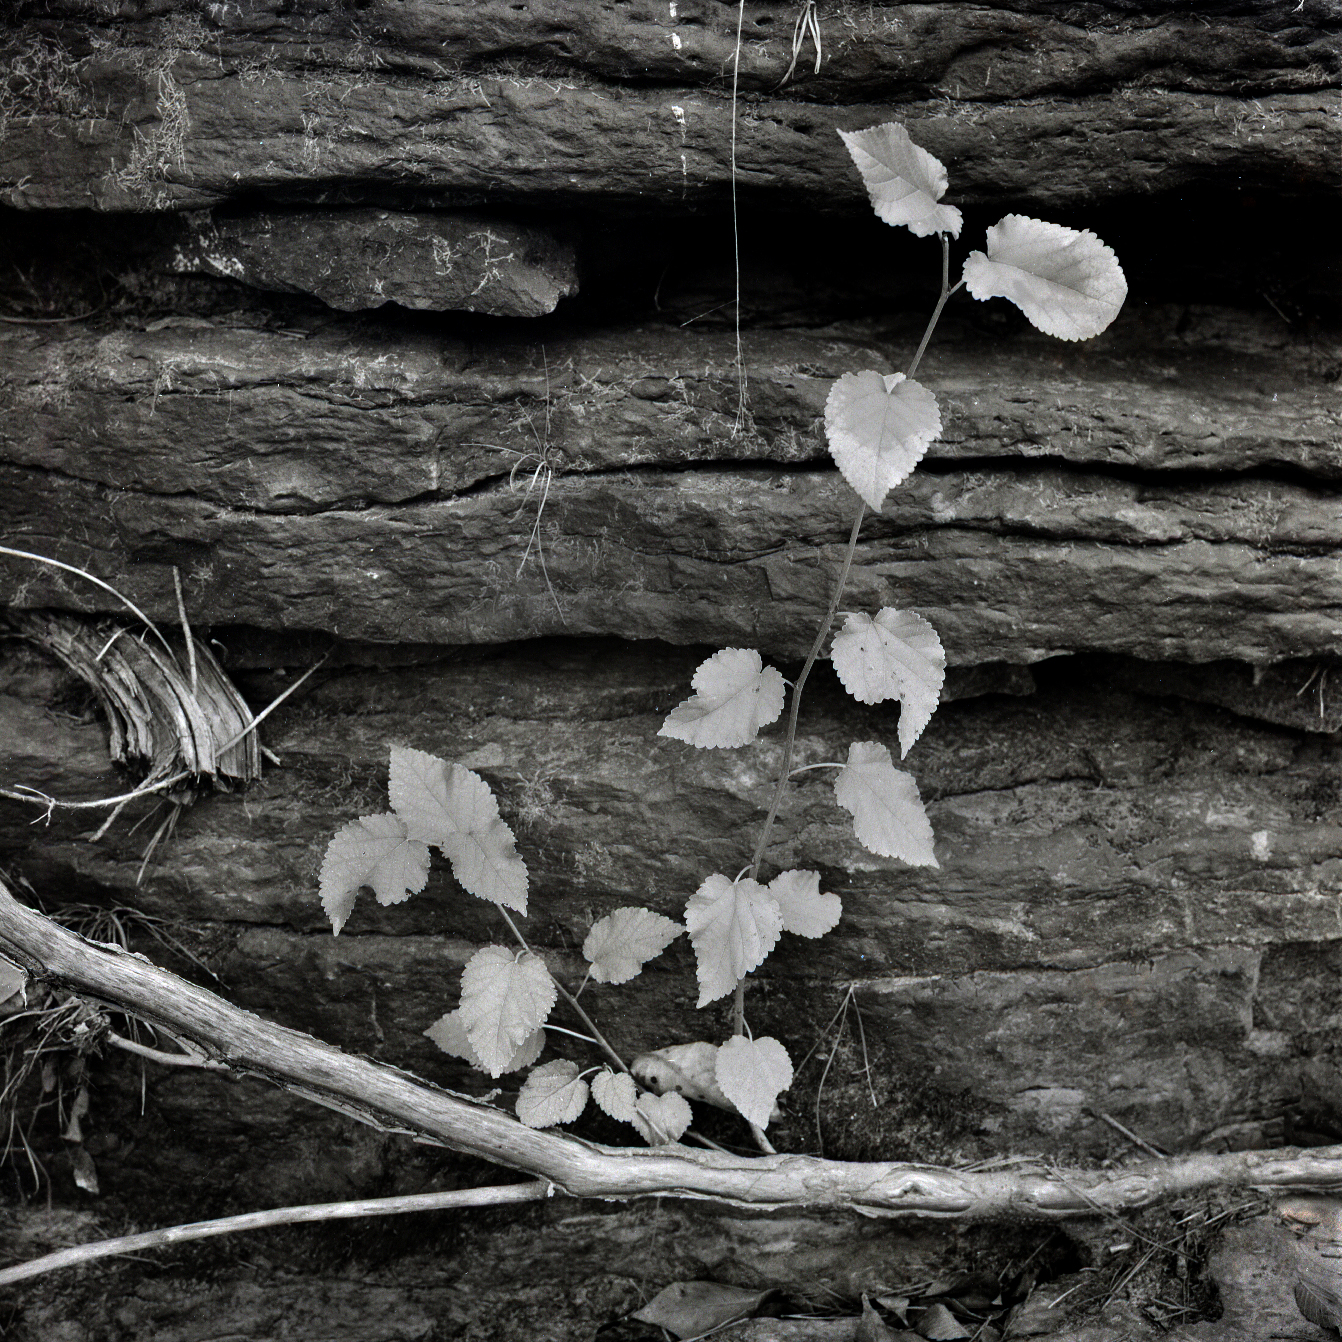 Photography by John Sykes Jr. (338)